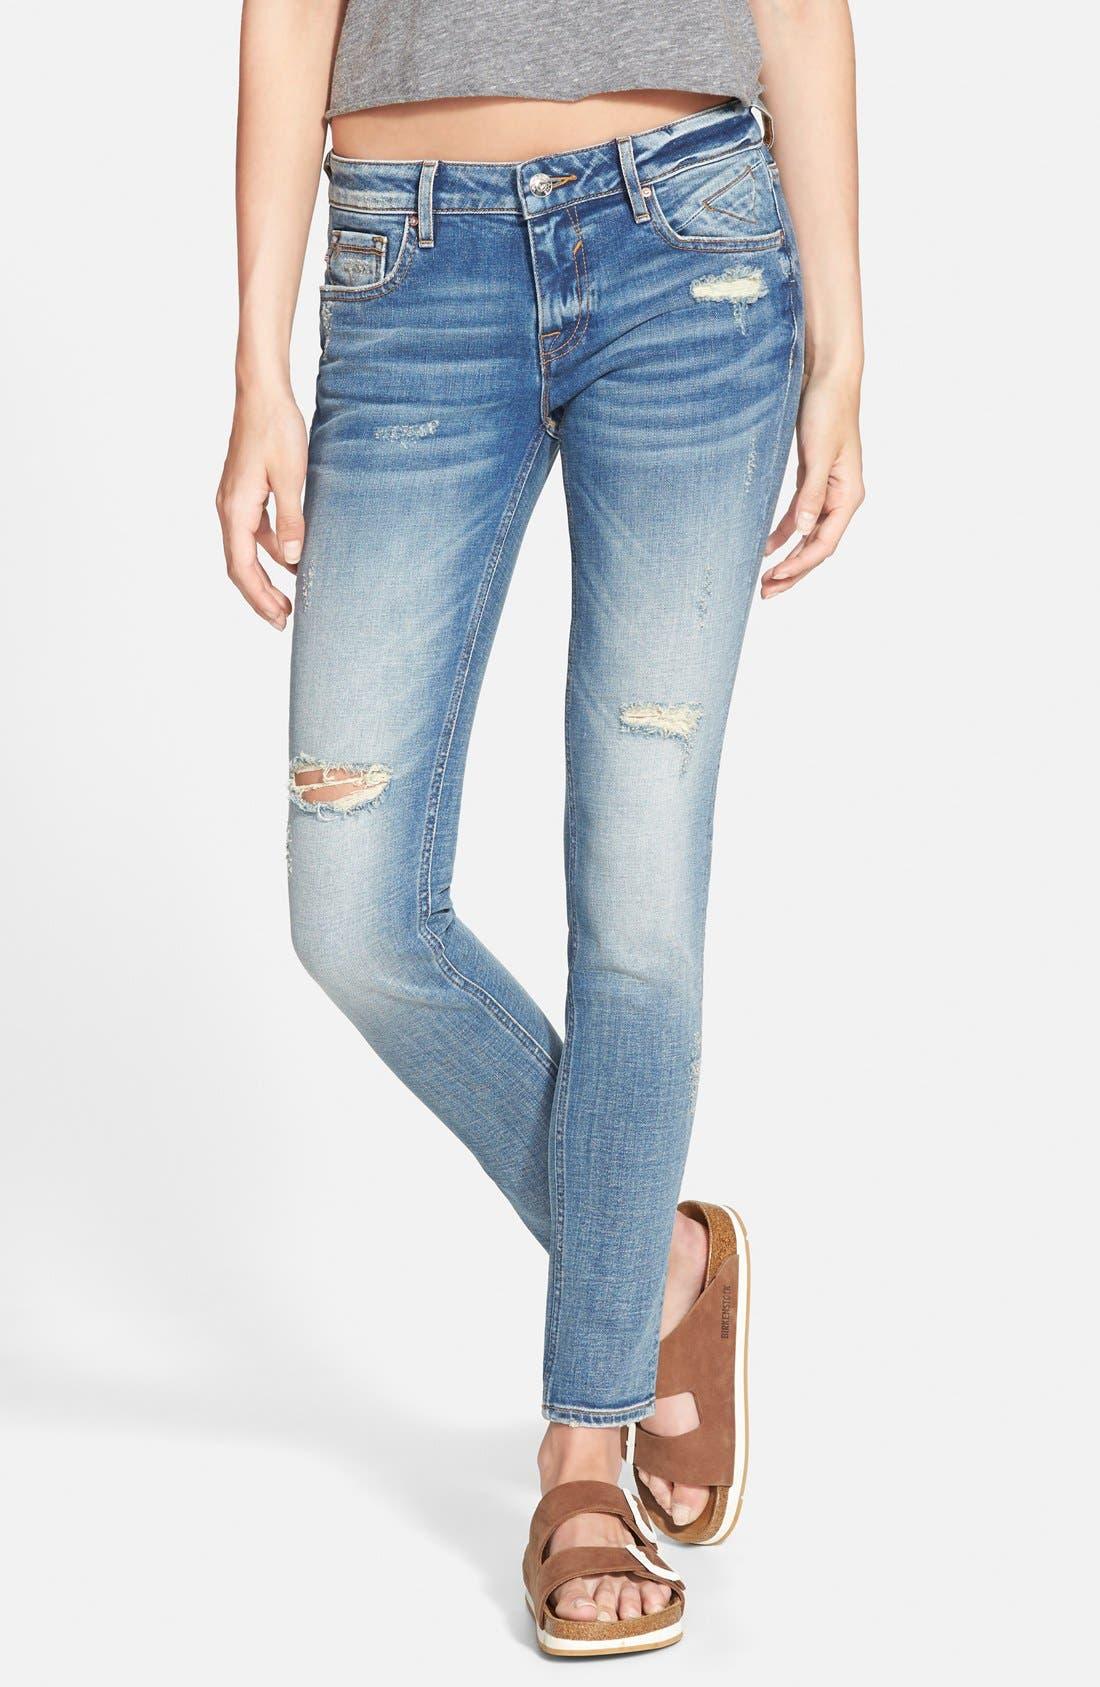 Alternate Image 1 Selected - Vigoss Distressed Skinny Jeans (Light Wash)